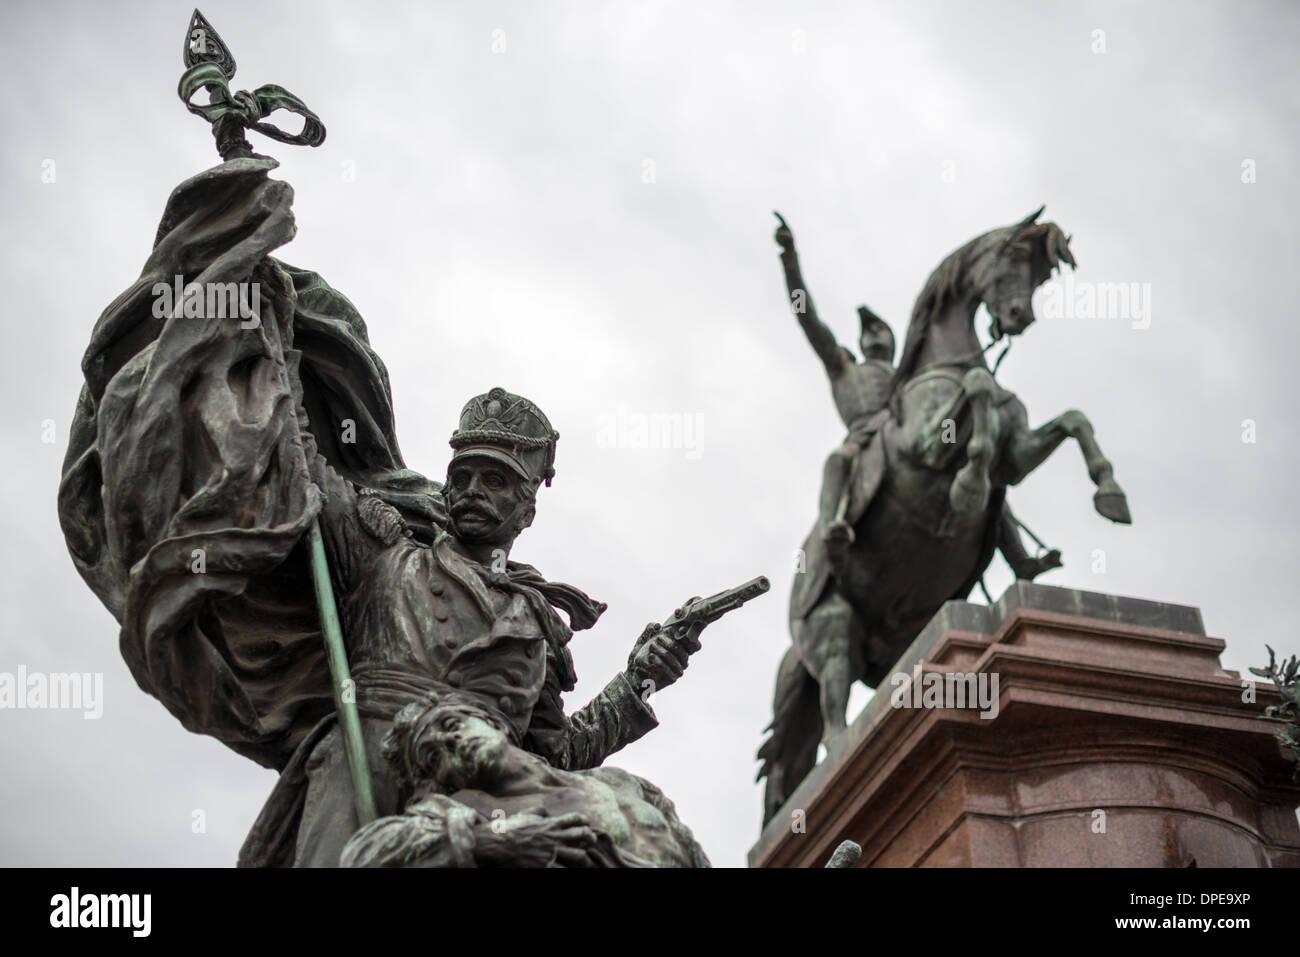 BUENOS AIRES, Argentina - Statue of Jose de San Martín in Plaza San Martin in Buenos Aires Argentina. - Stock Image